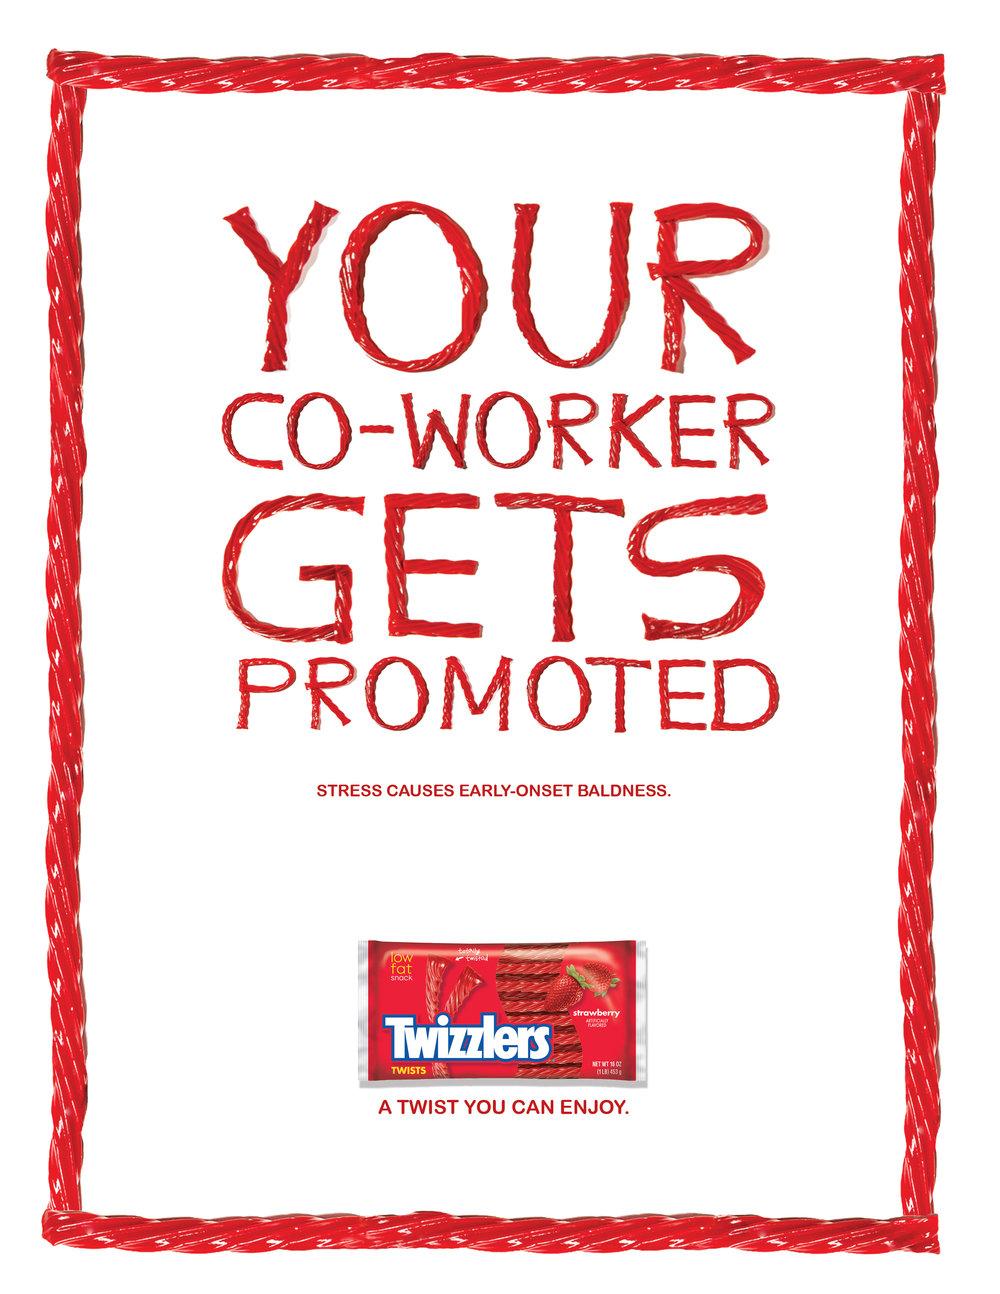 Twizzlers Print 1